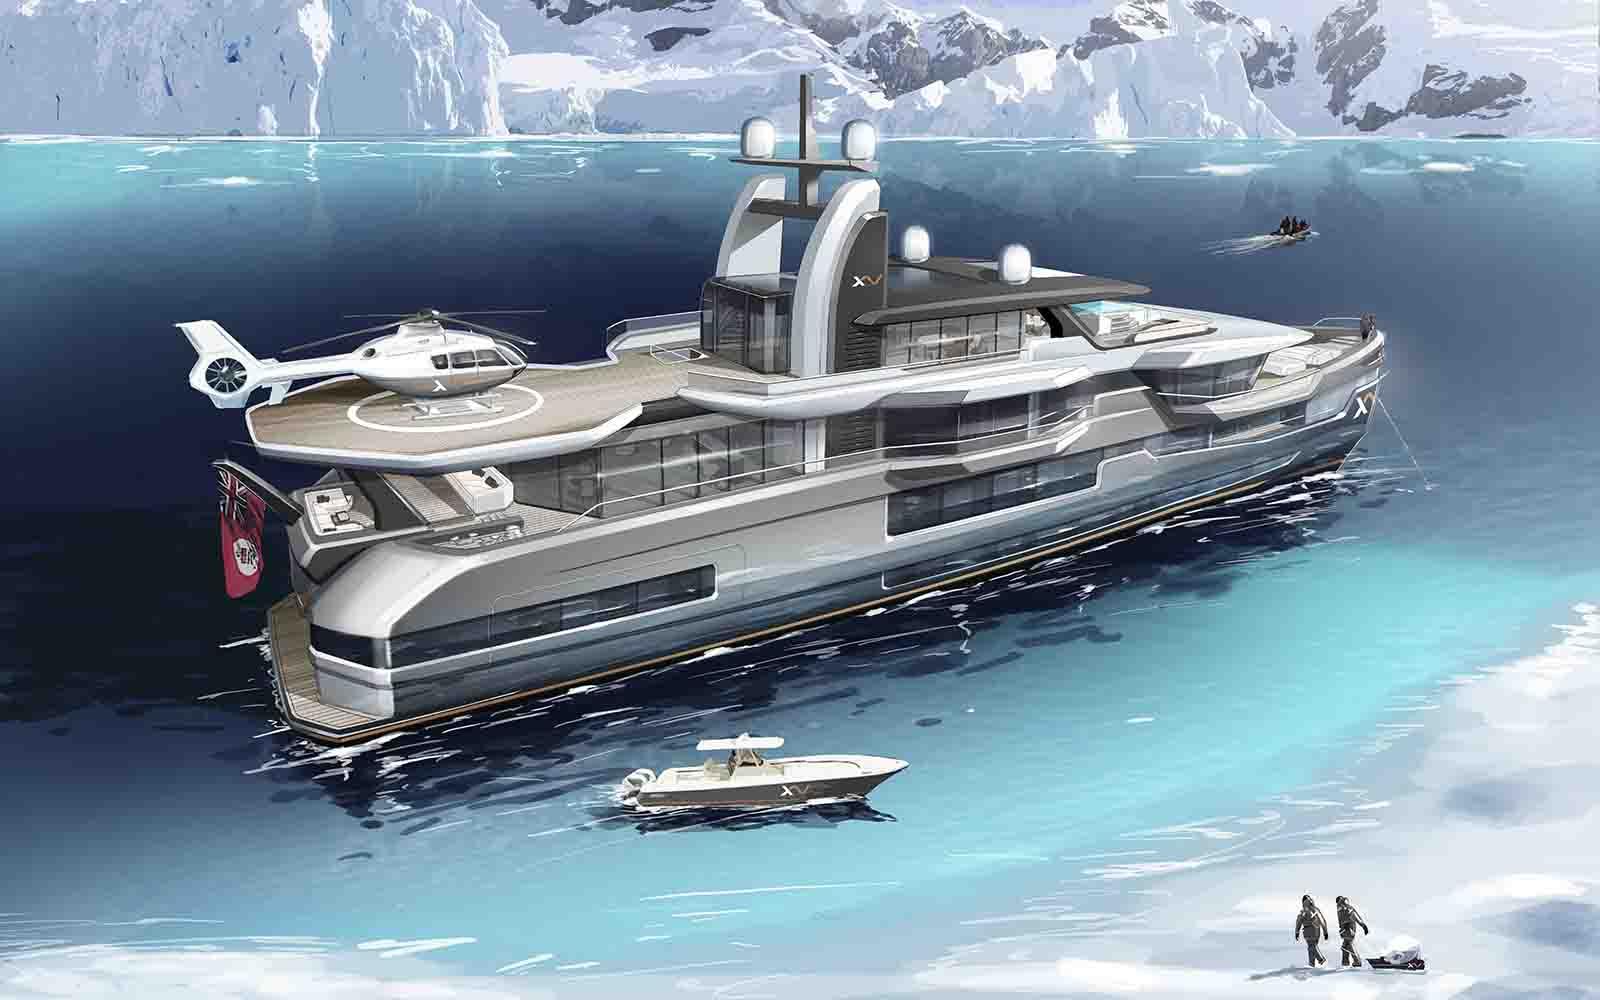 heesen yacht explorer xventure - boat shopping